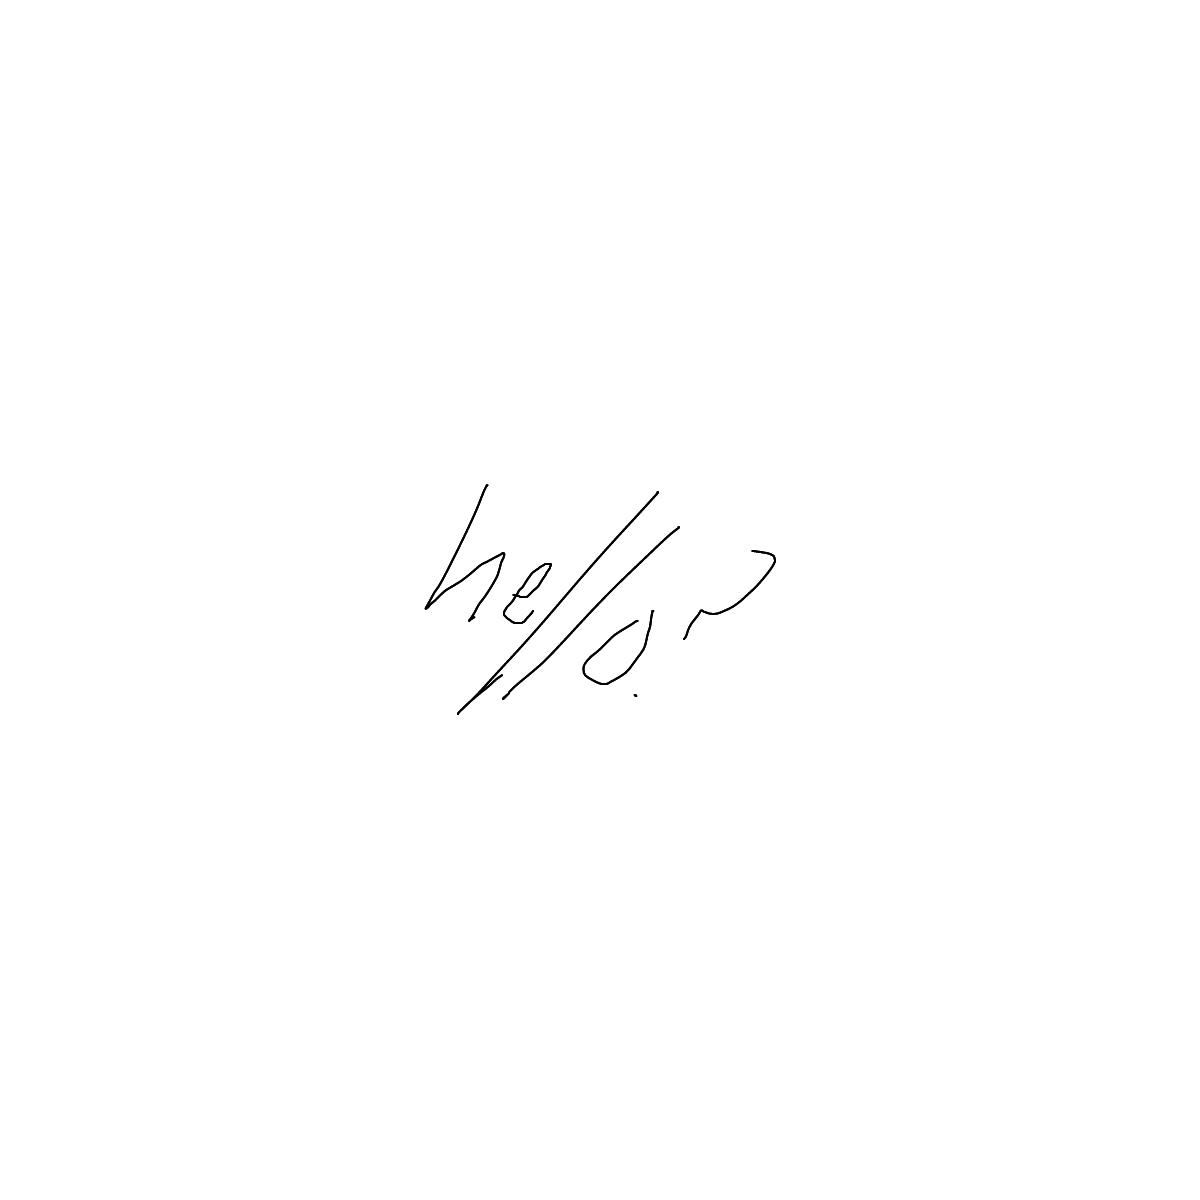 BAAAM drawing#16580 lat:66.4278869628906200lng: -33.3703231811523440